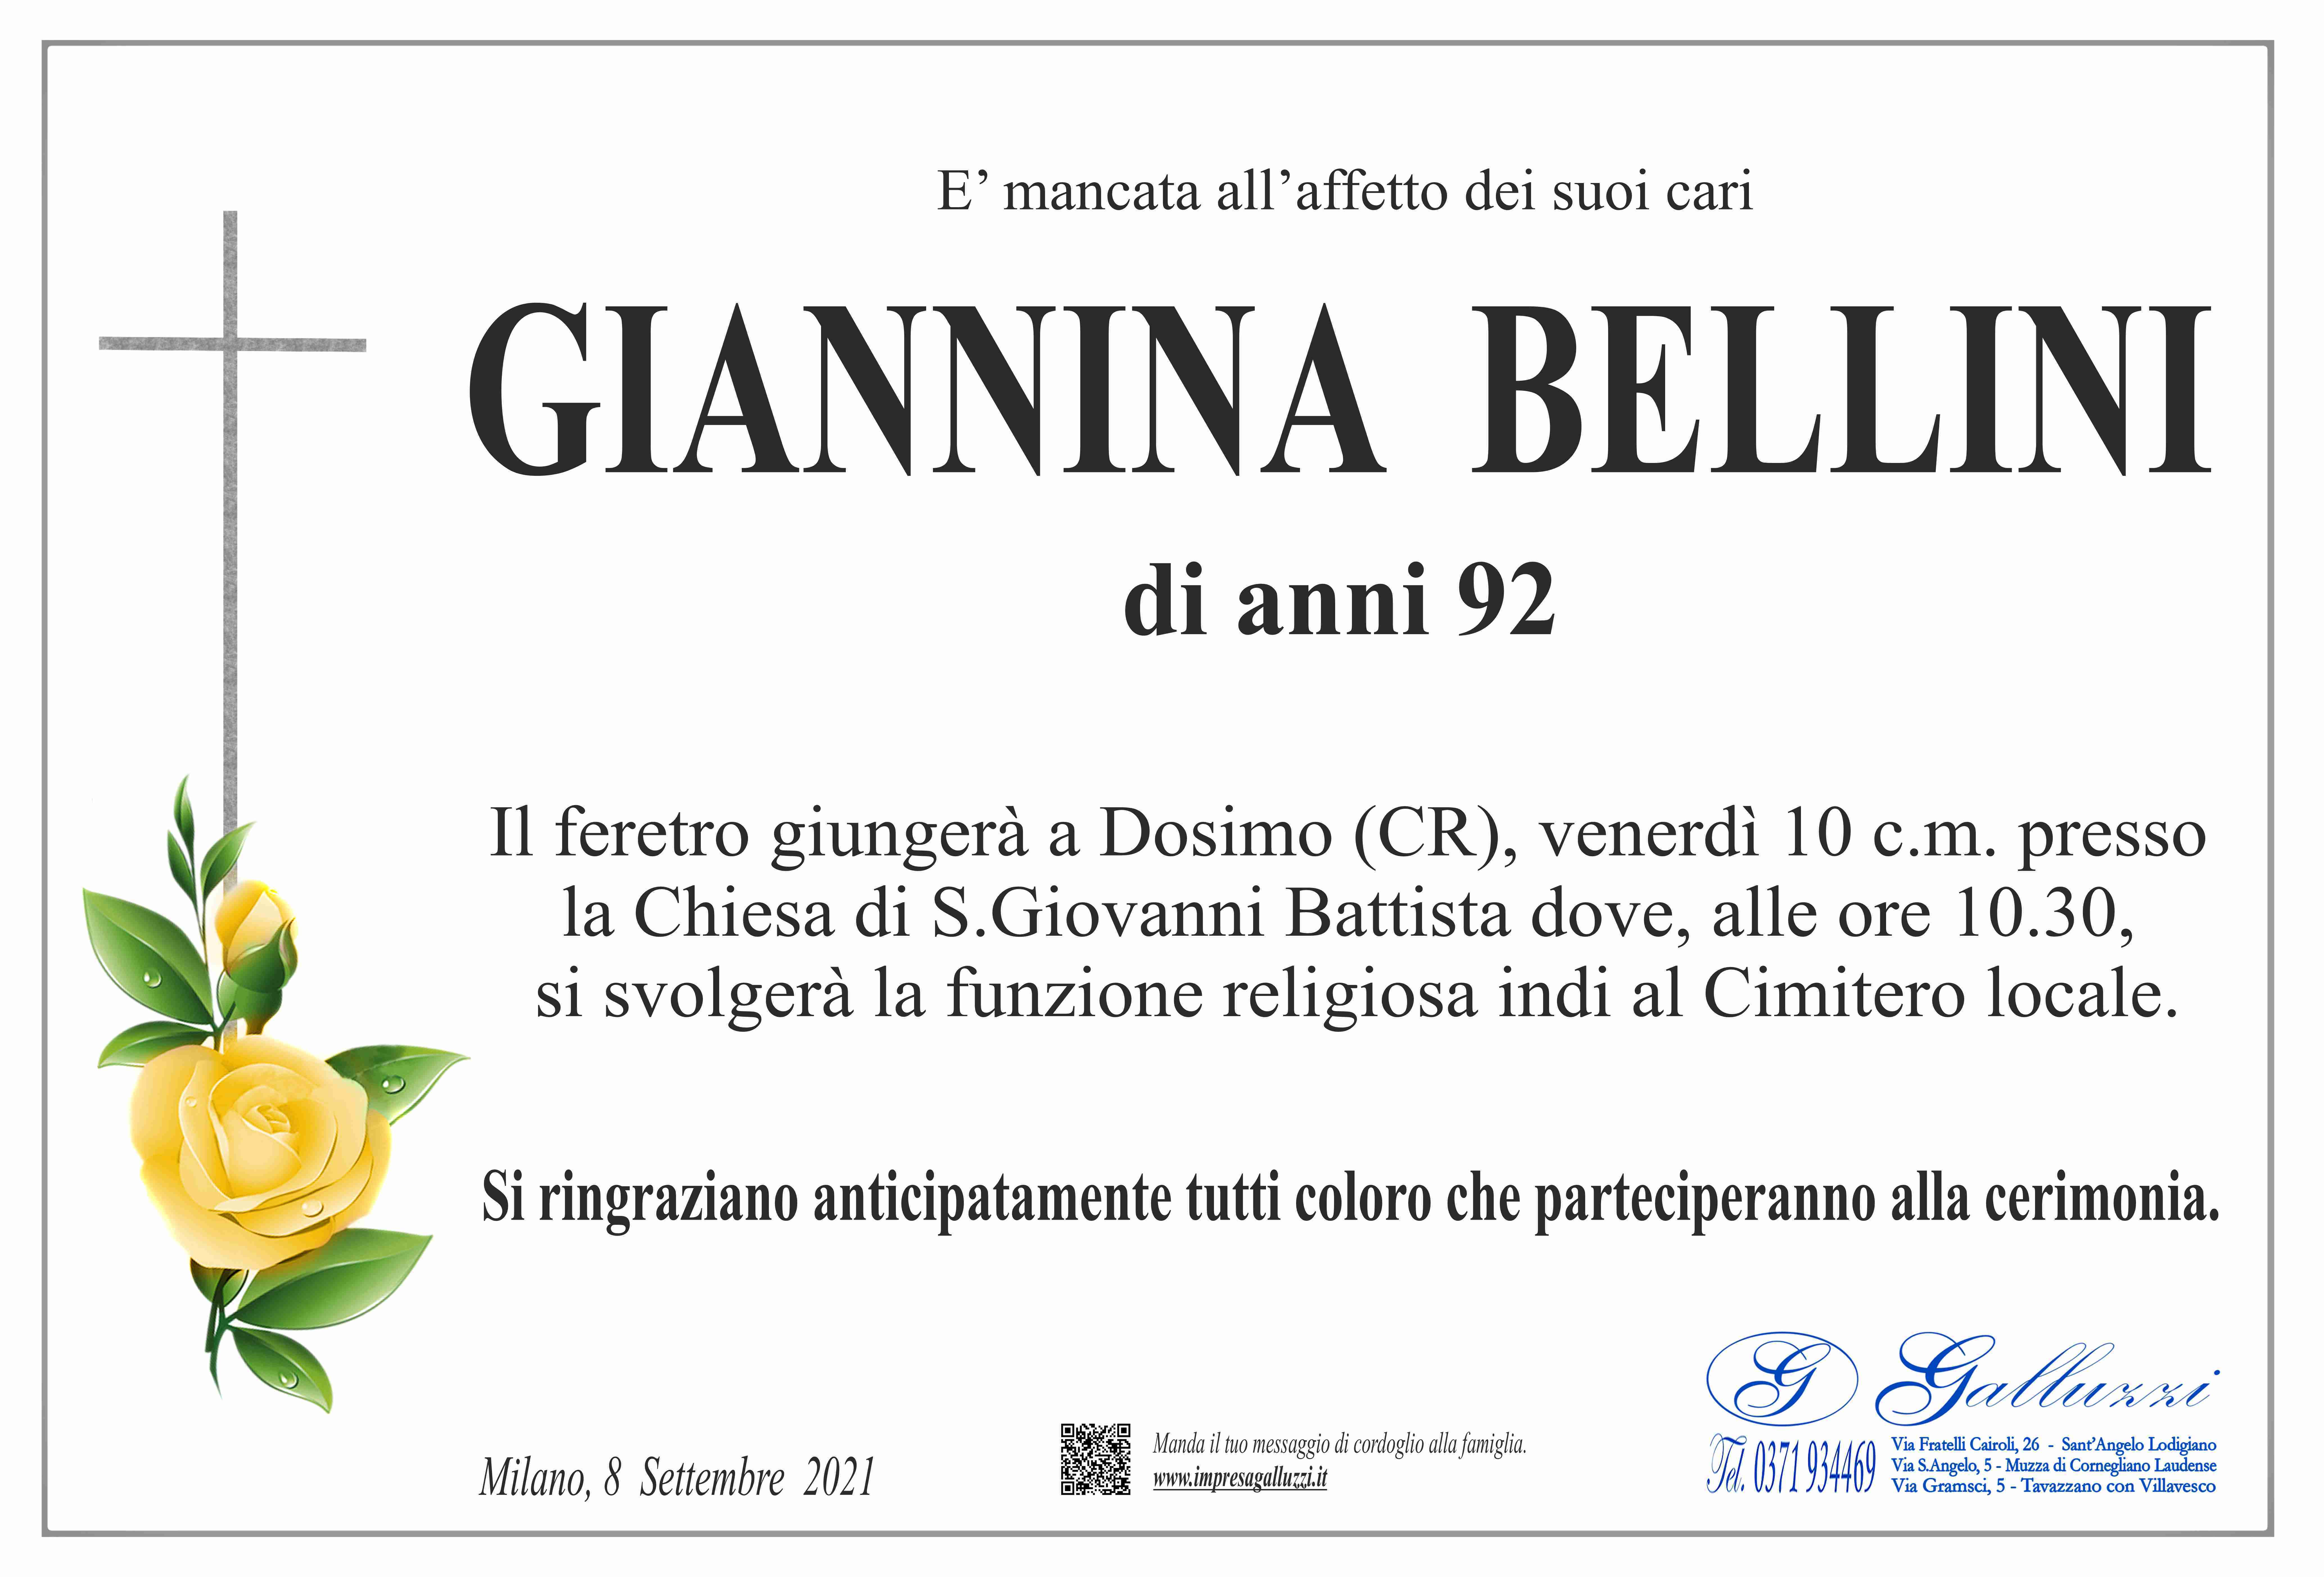 Giannina Bellini